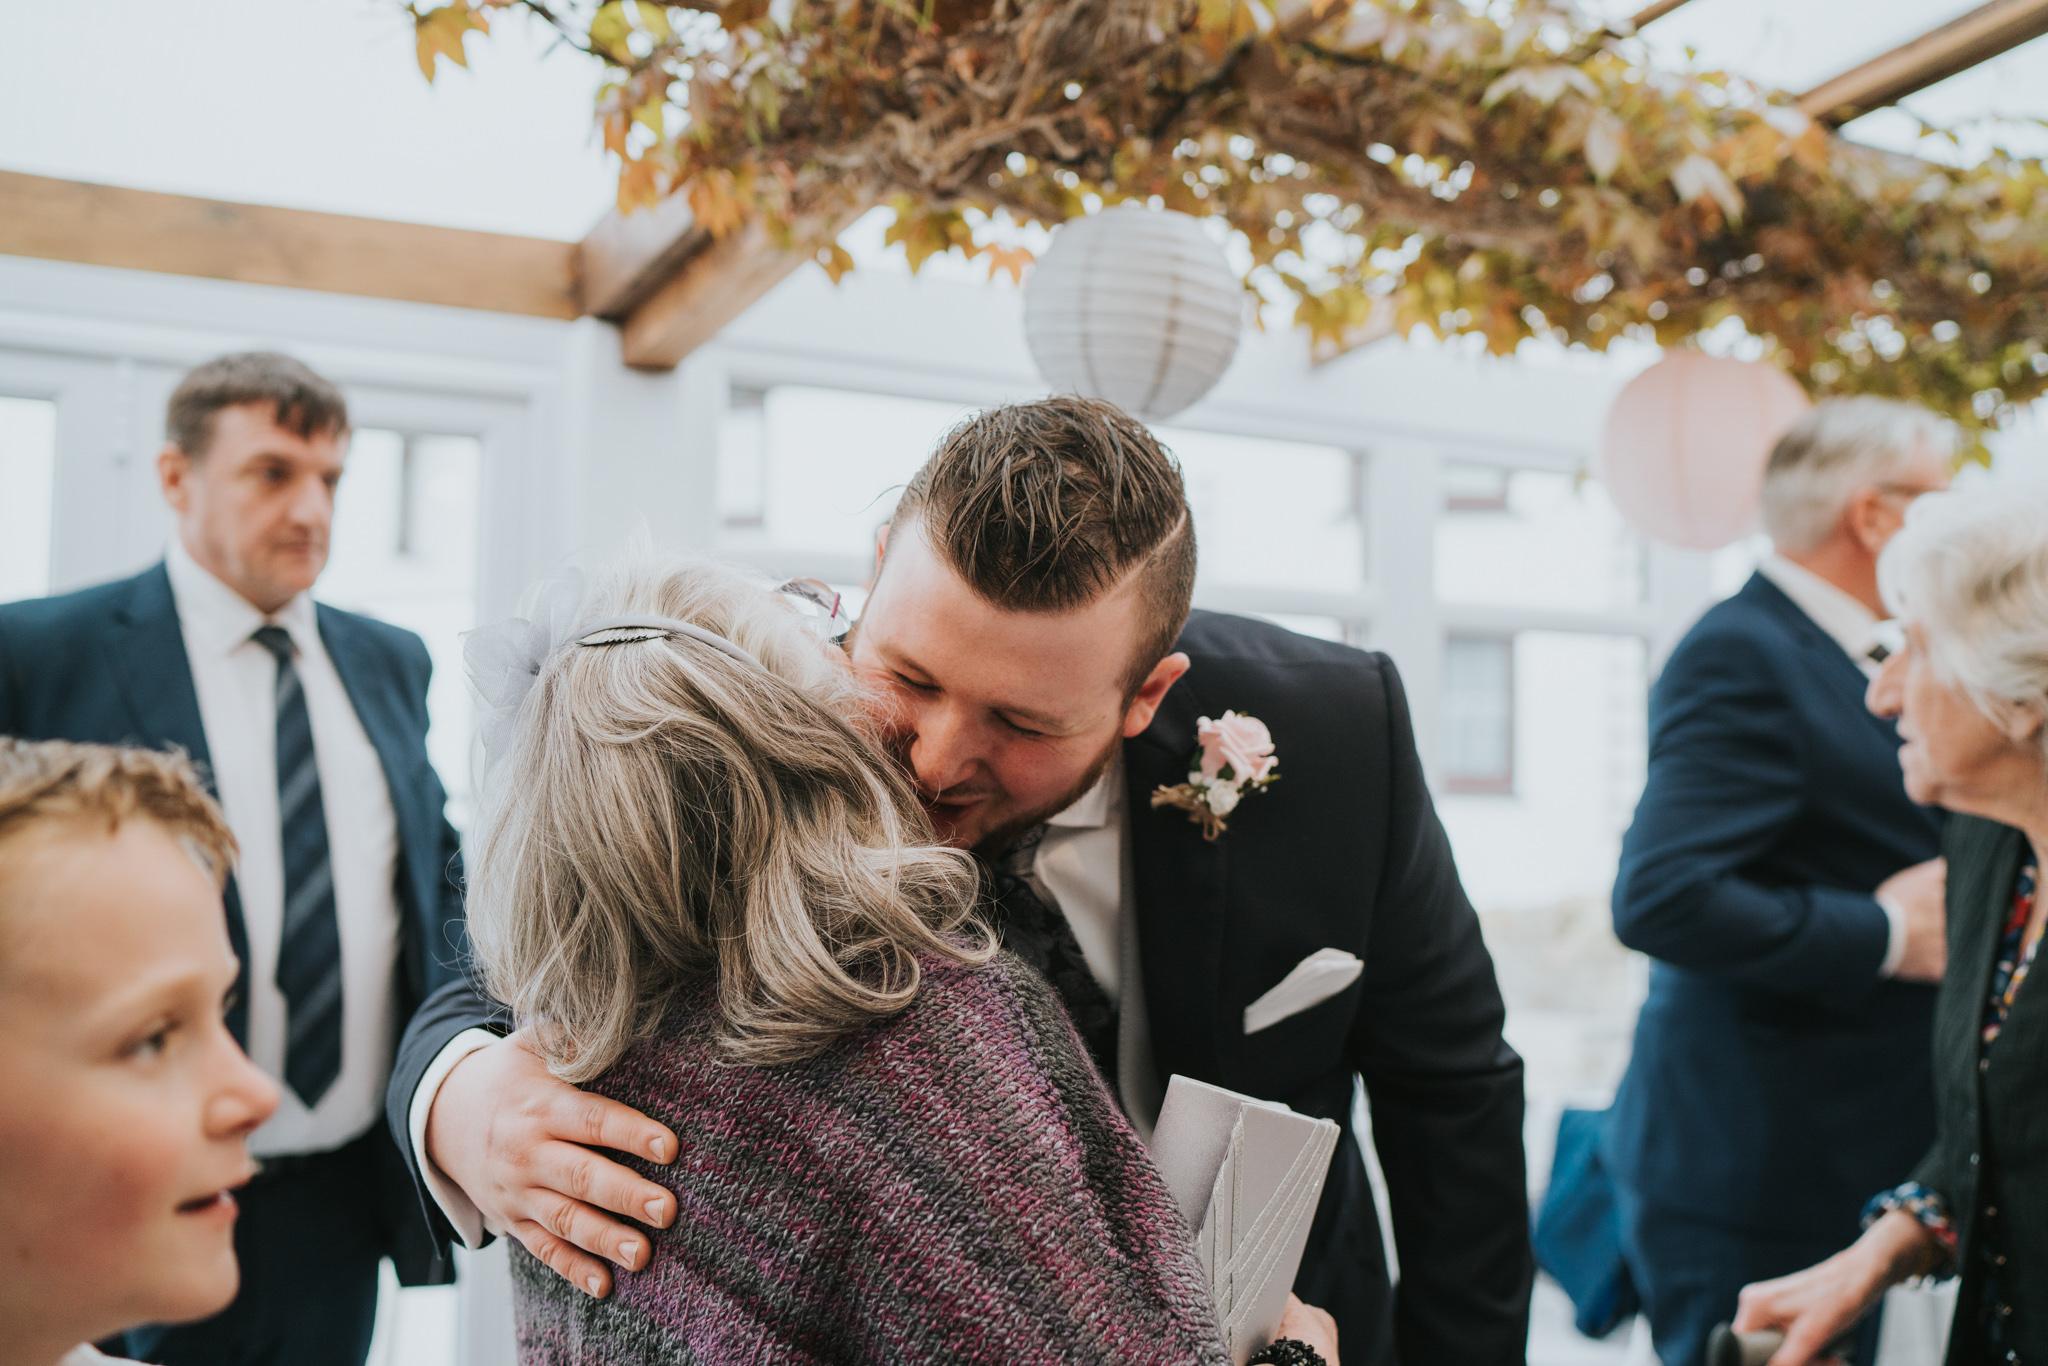 grace-sam-old-barn-clovelly-devon-wedding-photographer-grace-elizabeth-essex-suffolk-norfolk-wedding-photographer (98 of 132).jpg